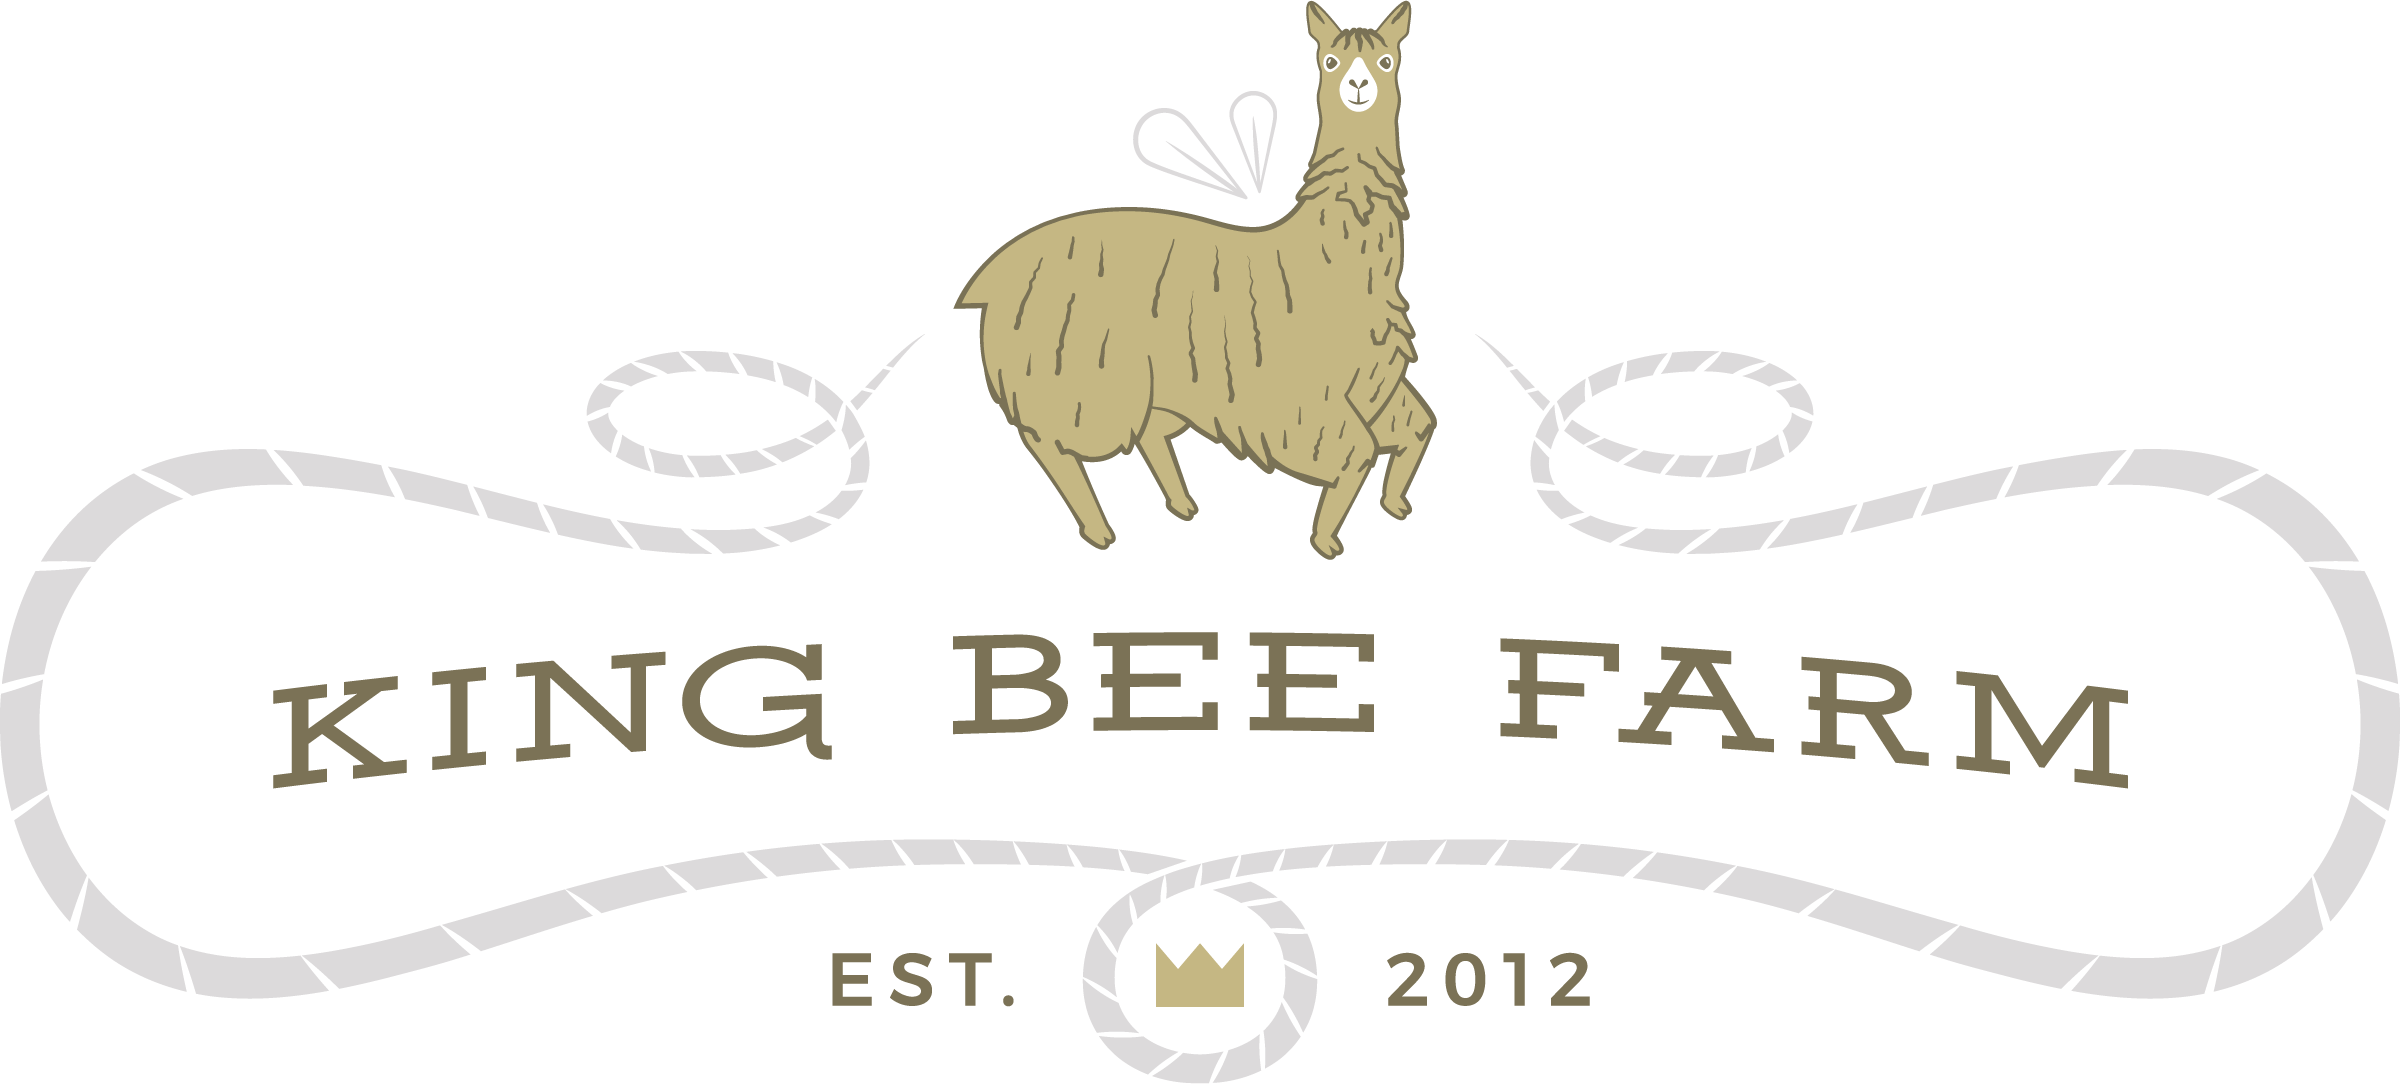 Powder puff football clipart clipart freeuse stock King Bee Farm Profile: Powderpuff clipart freeuse stock